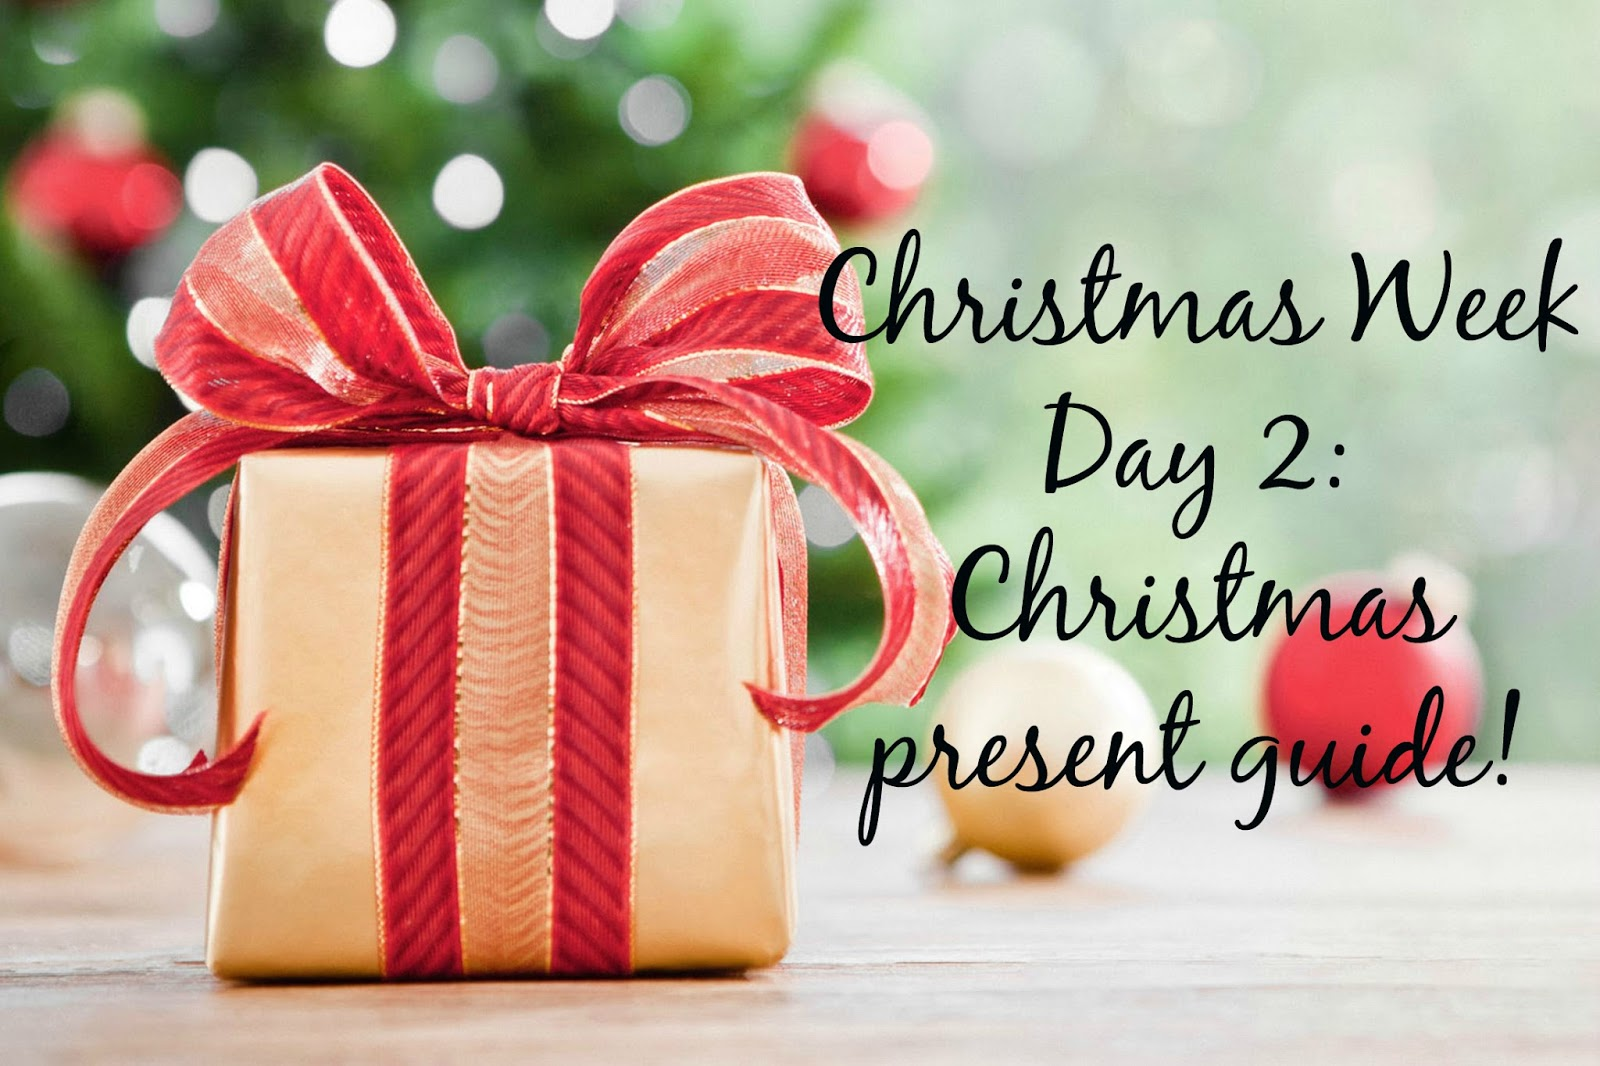 Christmas Week Day 2: Christmas present guide!